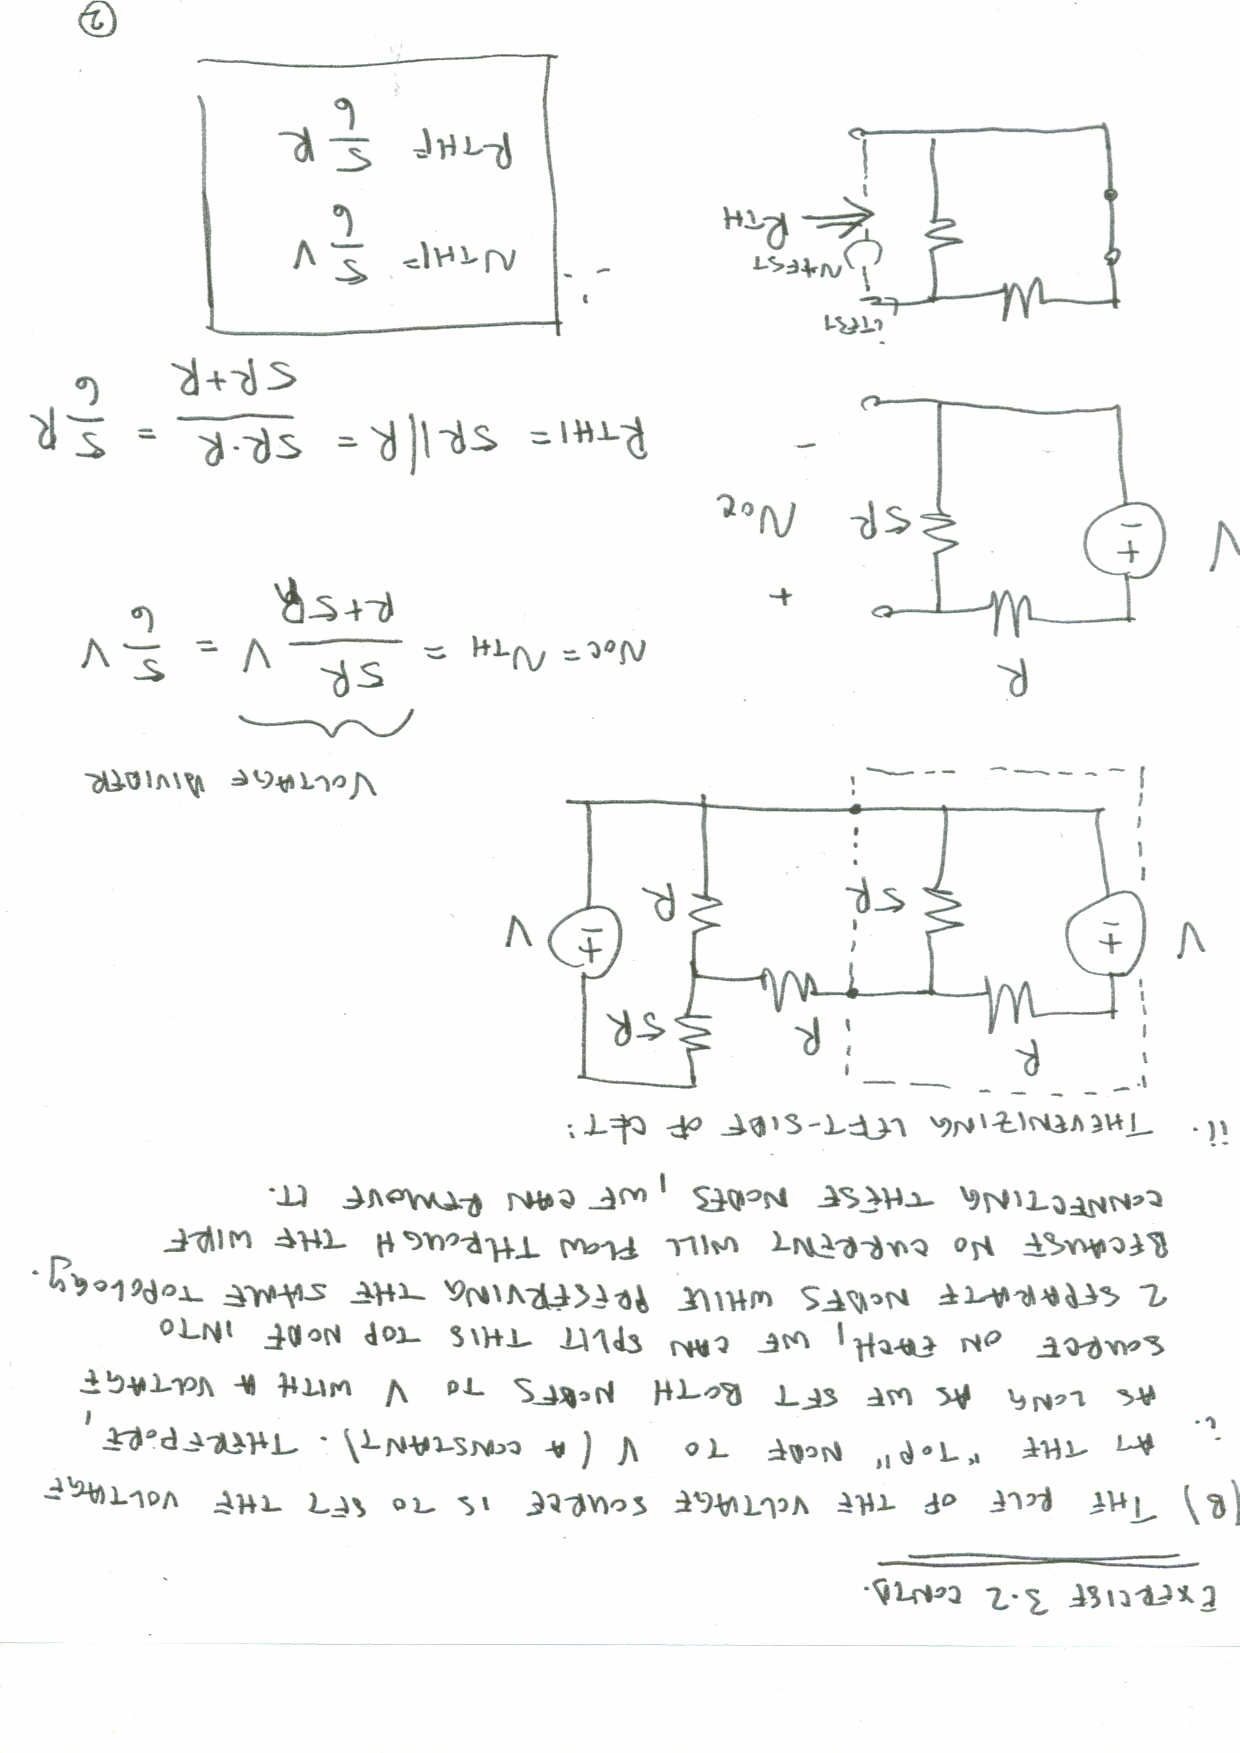 6002 Electronic Circuits Spring 2006 Circuit Analysis Johnson Handouts